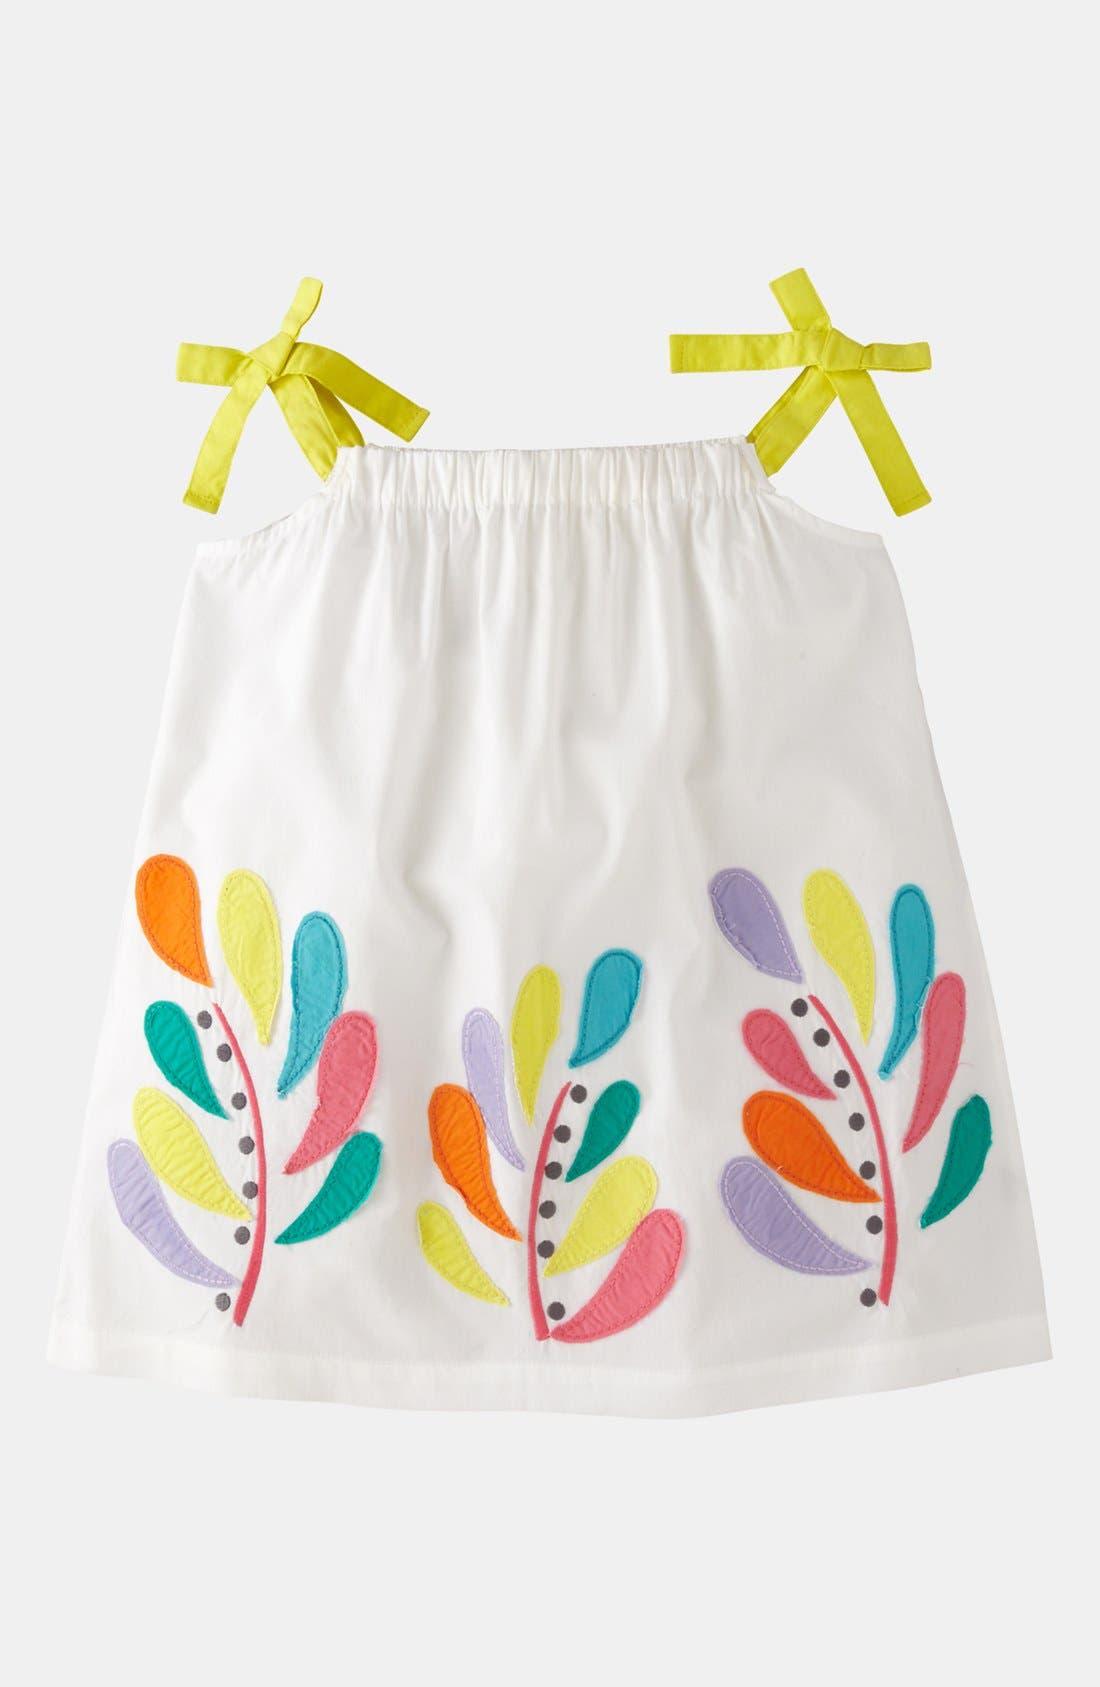 Alternate Image 1 Selected - Mini Boden 'Appliqué - Color Pop' Top (Toddler)